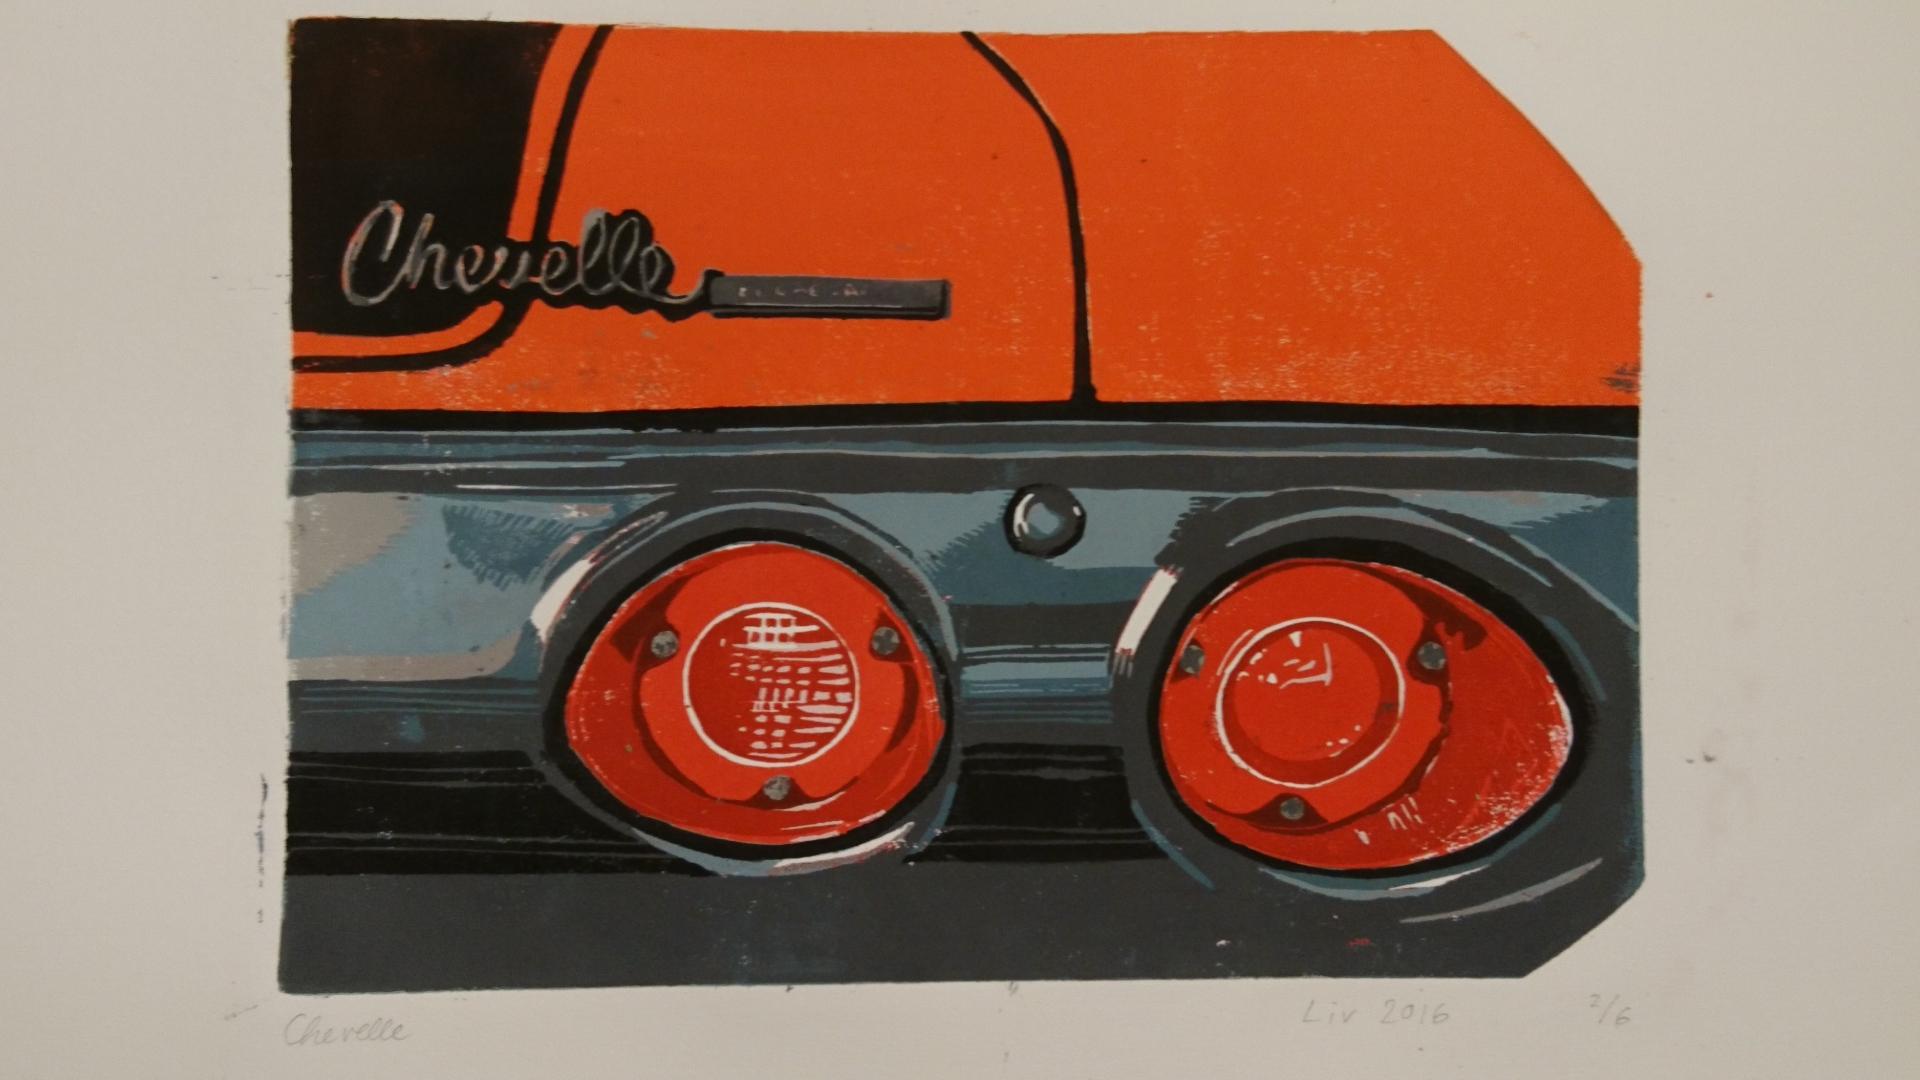 Chevelle (orange)